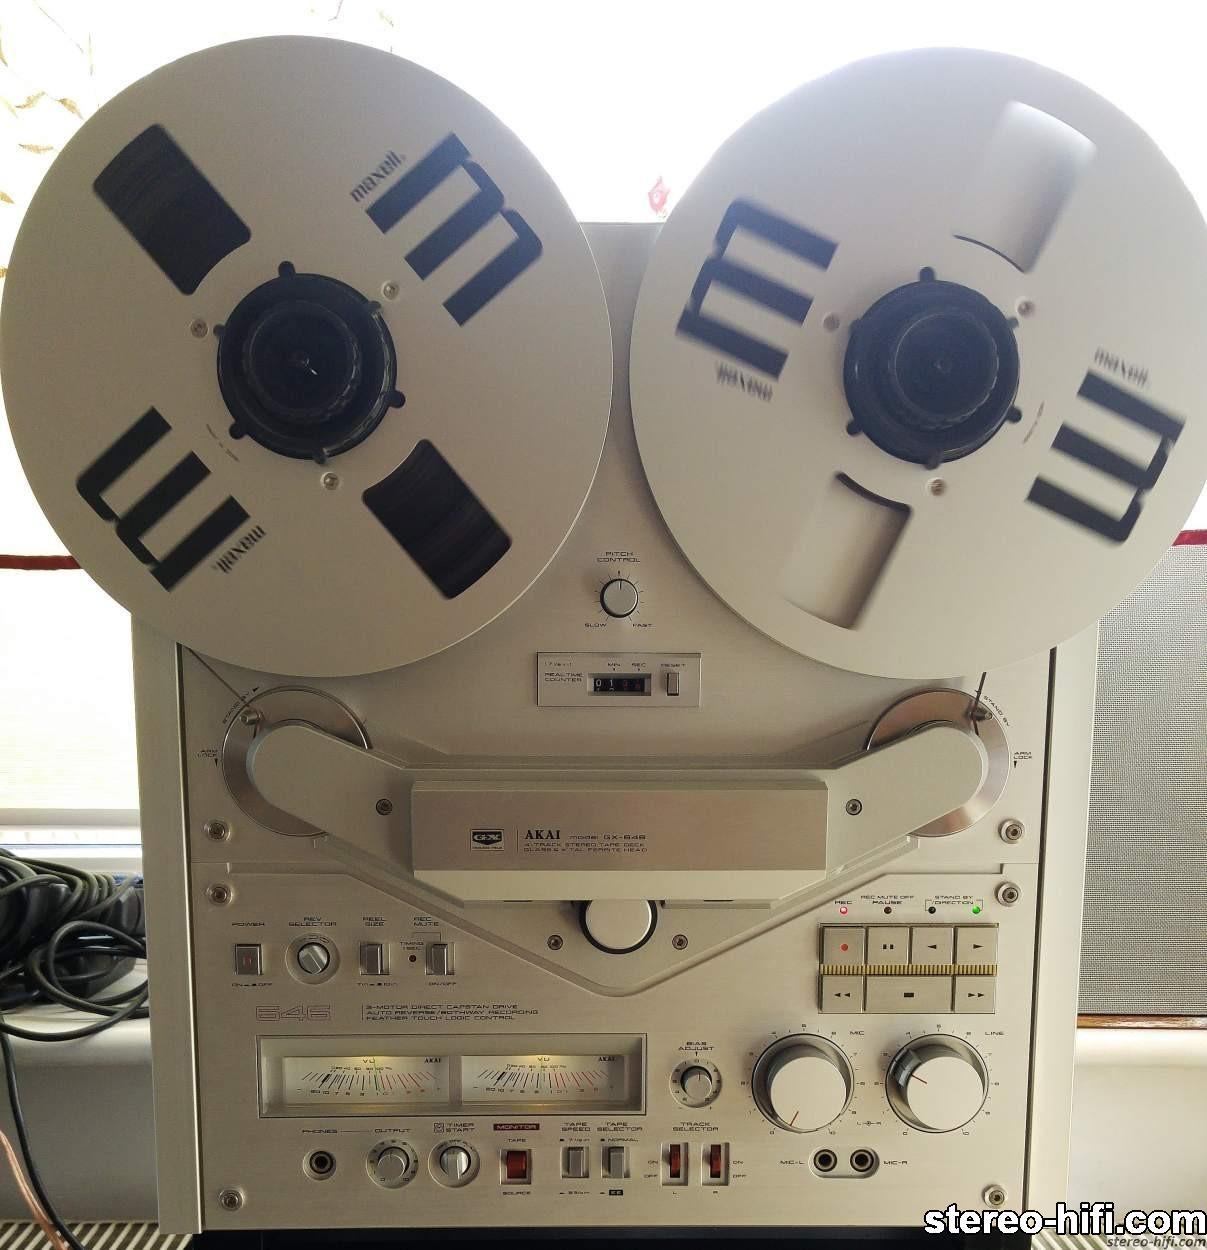 Akai GX-646 front